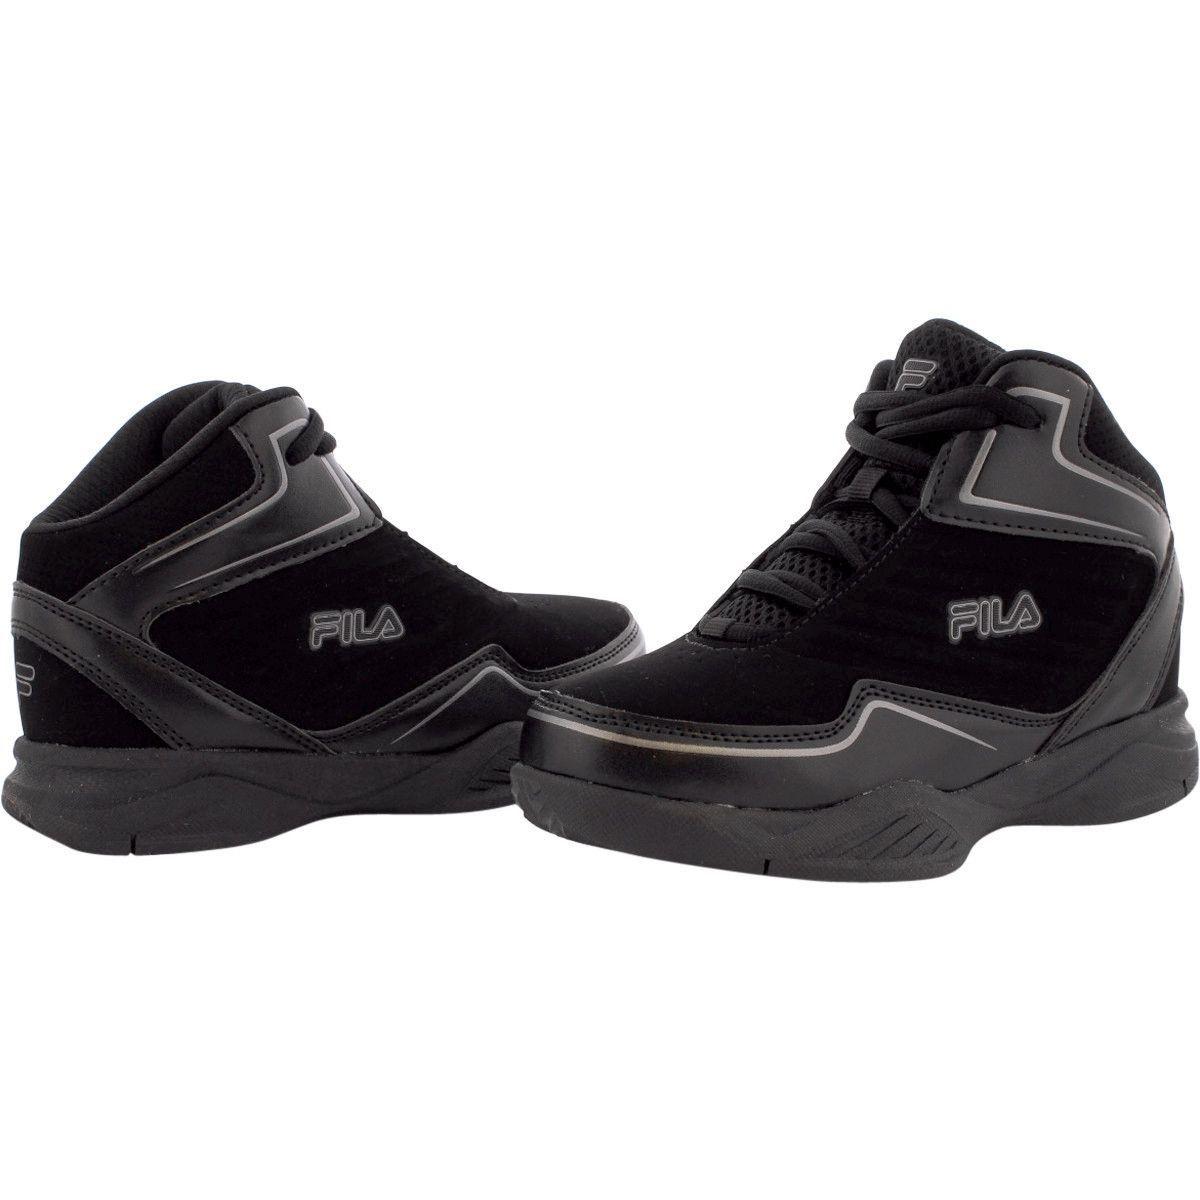 fila shoes boys 50s attire men